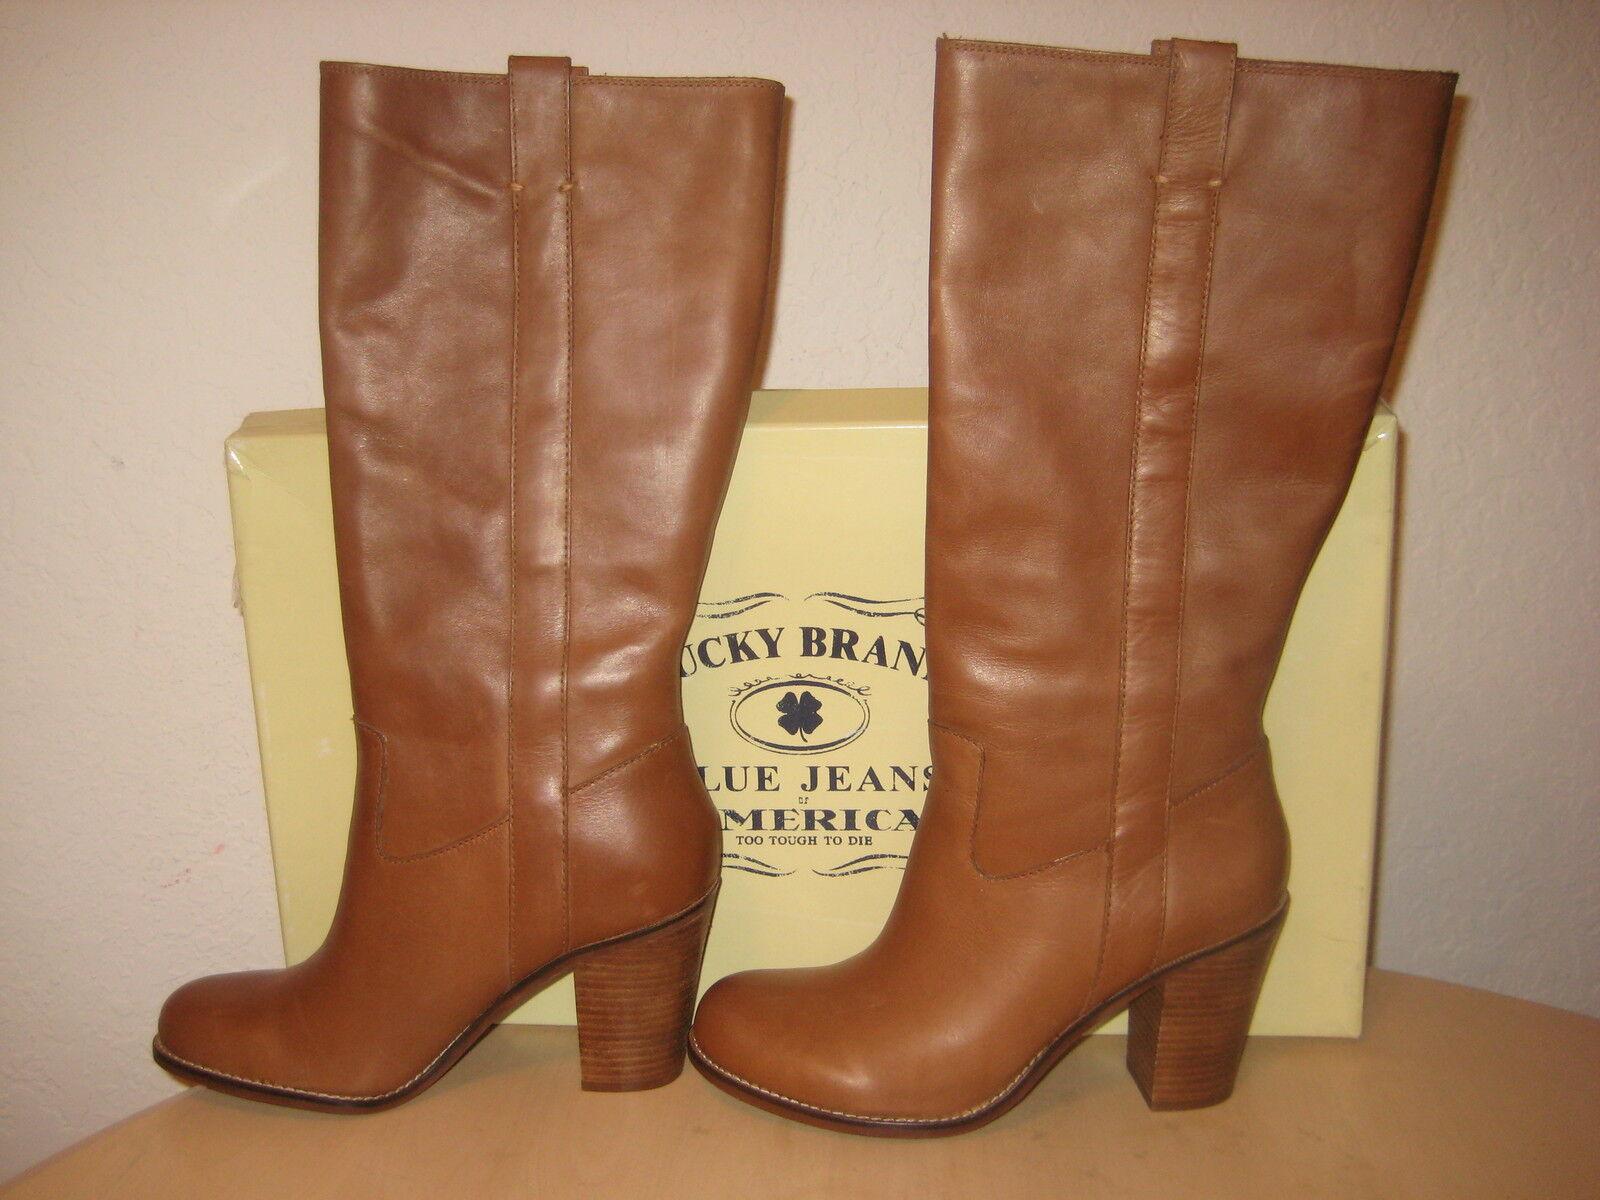 Lucky Brand Schuhes Größe 10 M Damenschuhe New High Maidie Tuscany Rider Knee High New Stiefel 08e48b